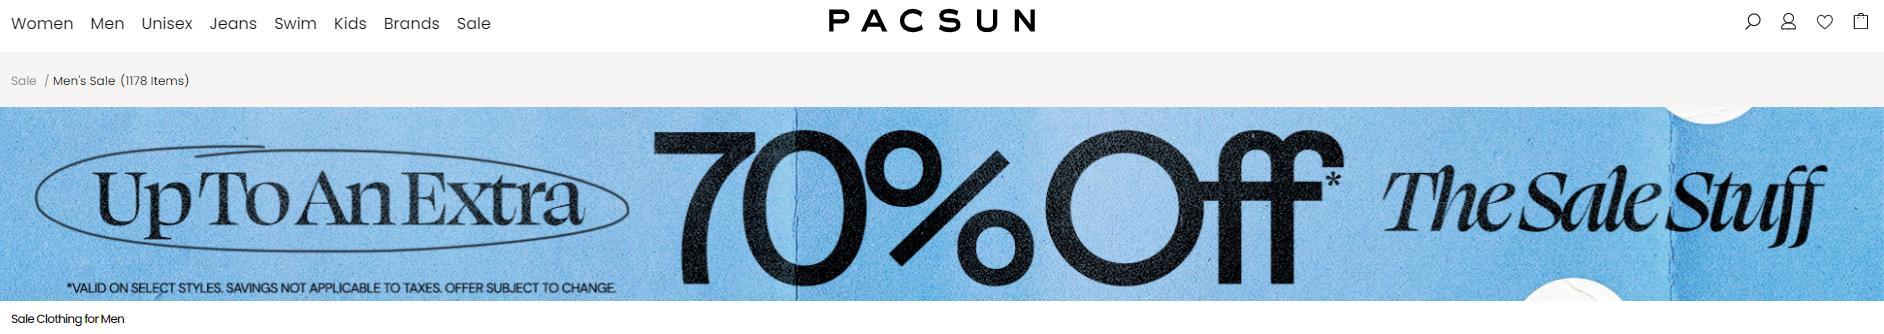 PacSun Promo Codes